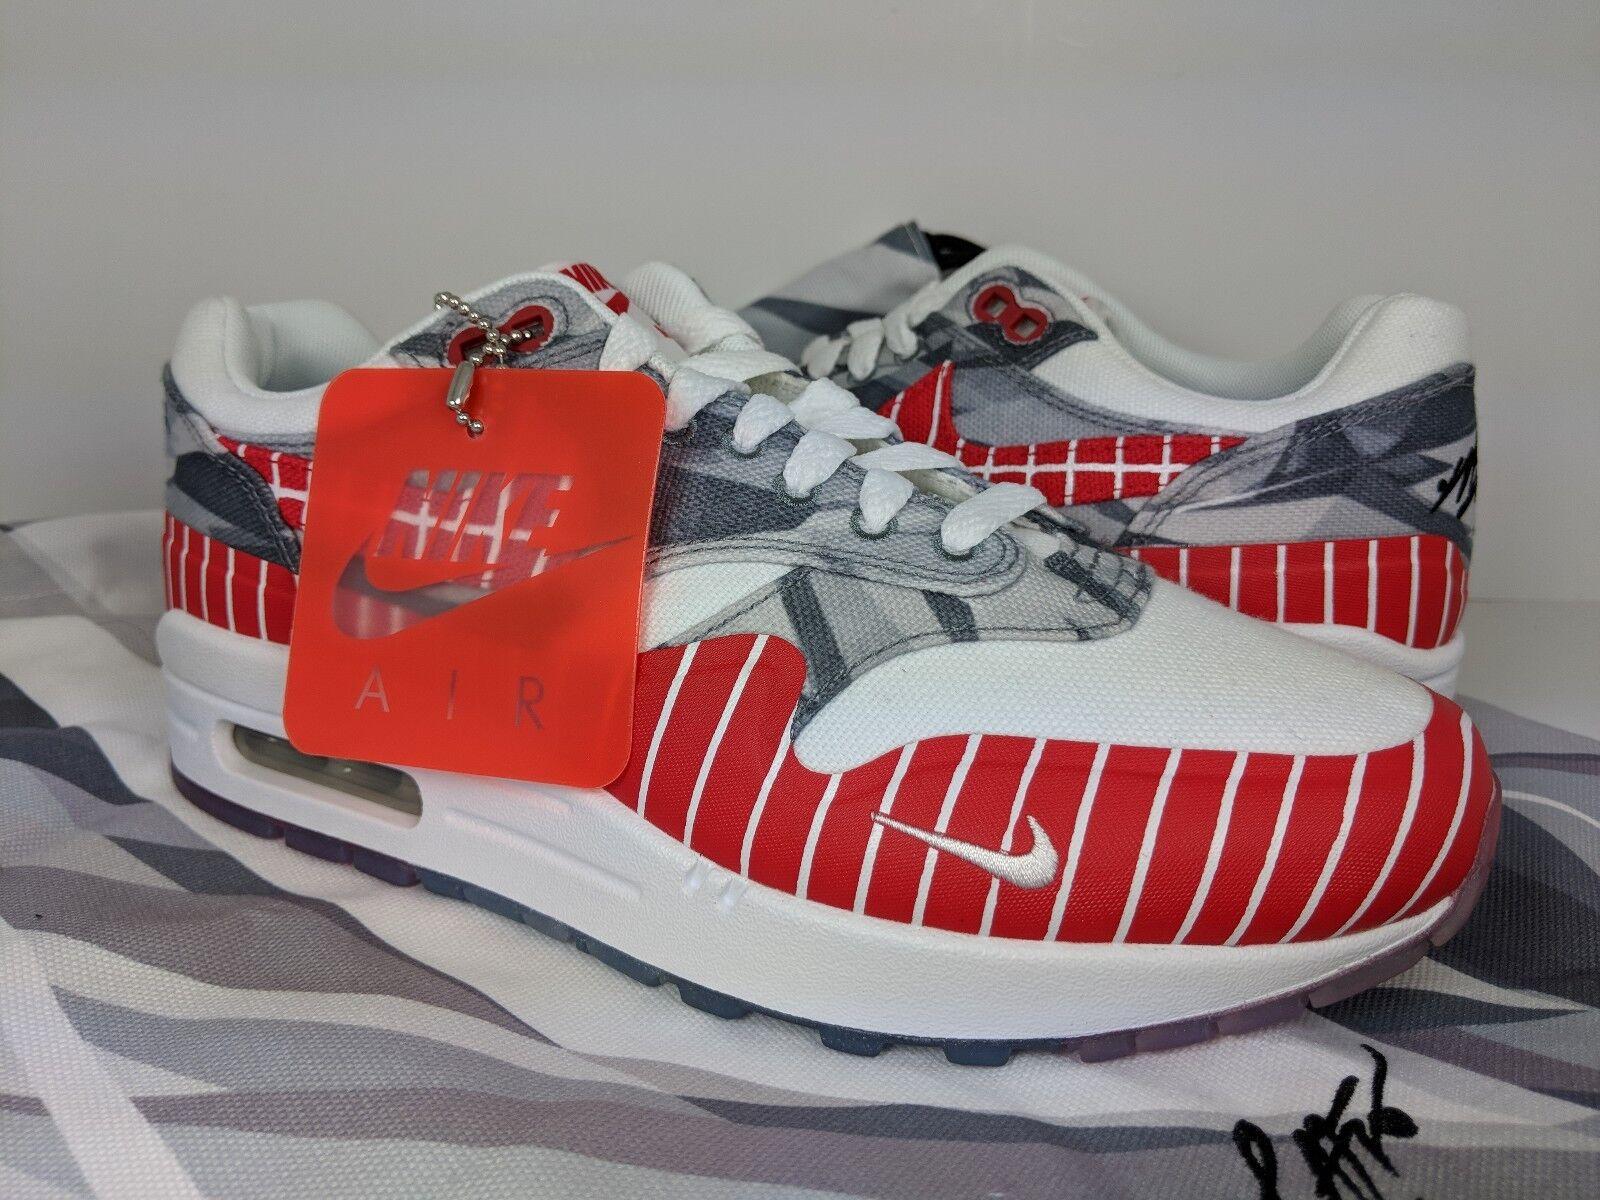 Nike Air Max 1 Los Primeros Latino Heritage Month LHM Grey Red [AH7740-100] sz 6